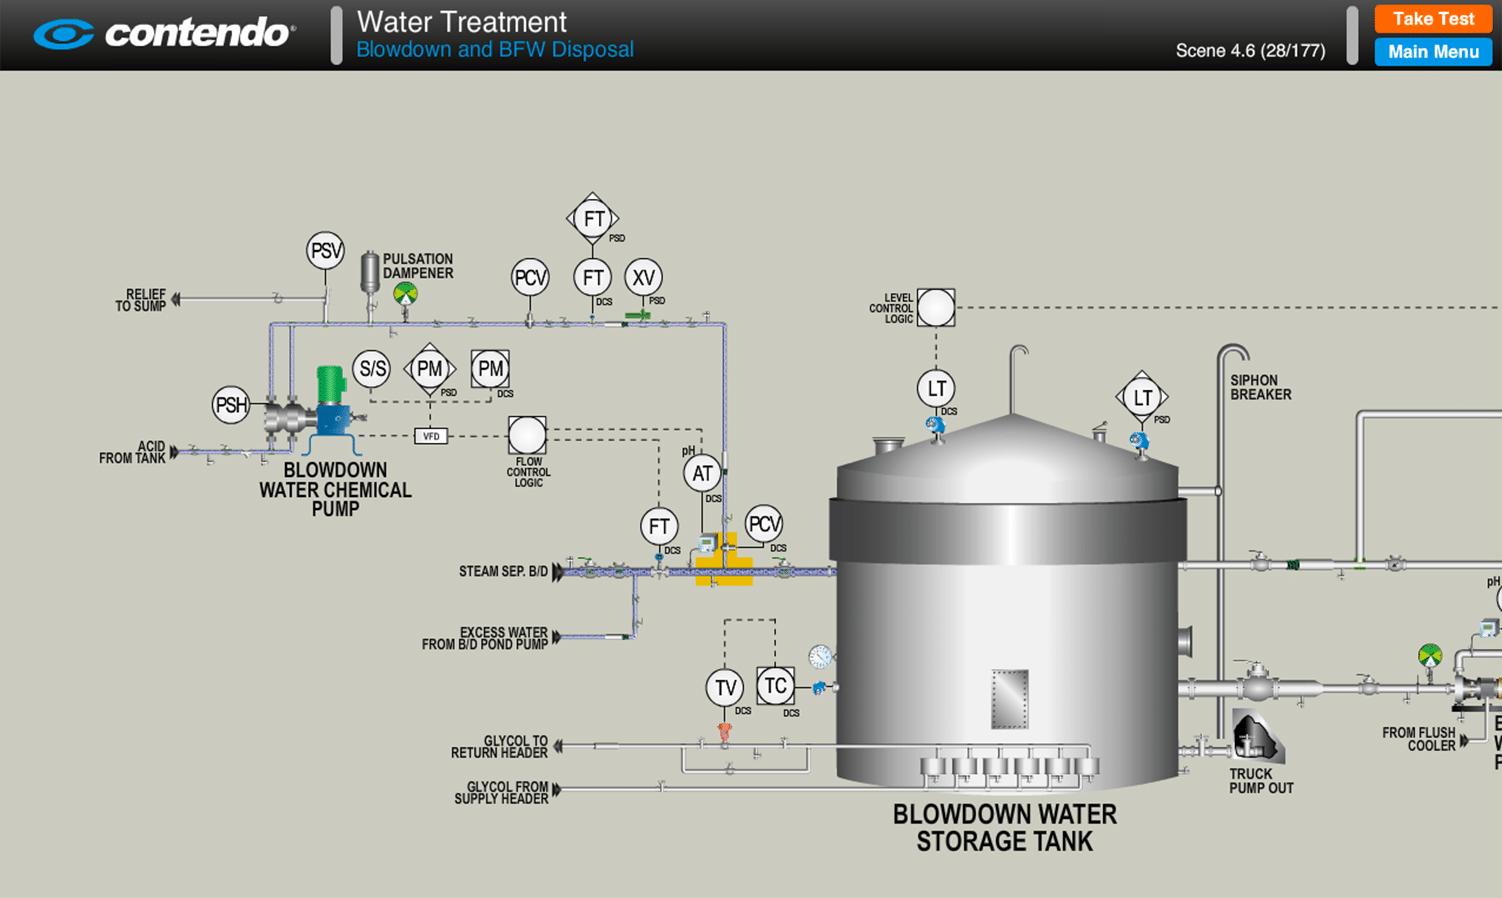 Boiler Feed Water ~ Blowdown and boiler feed water bfw disposal sagd oil